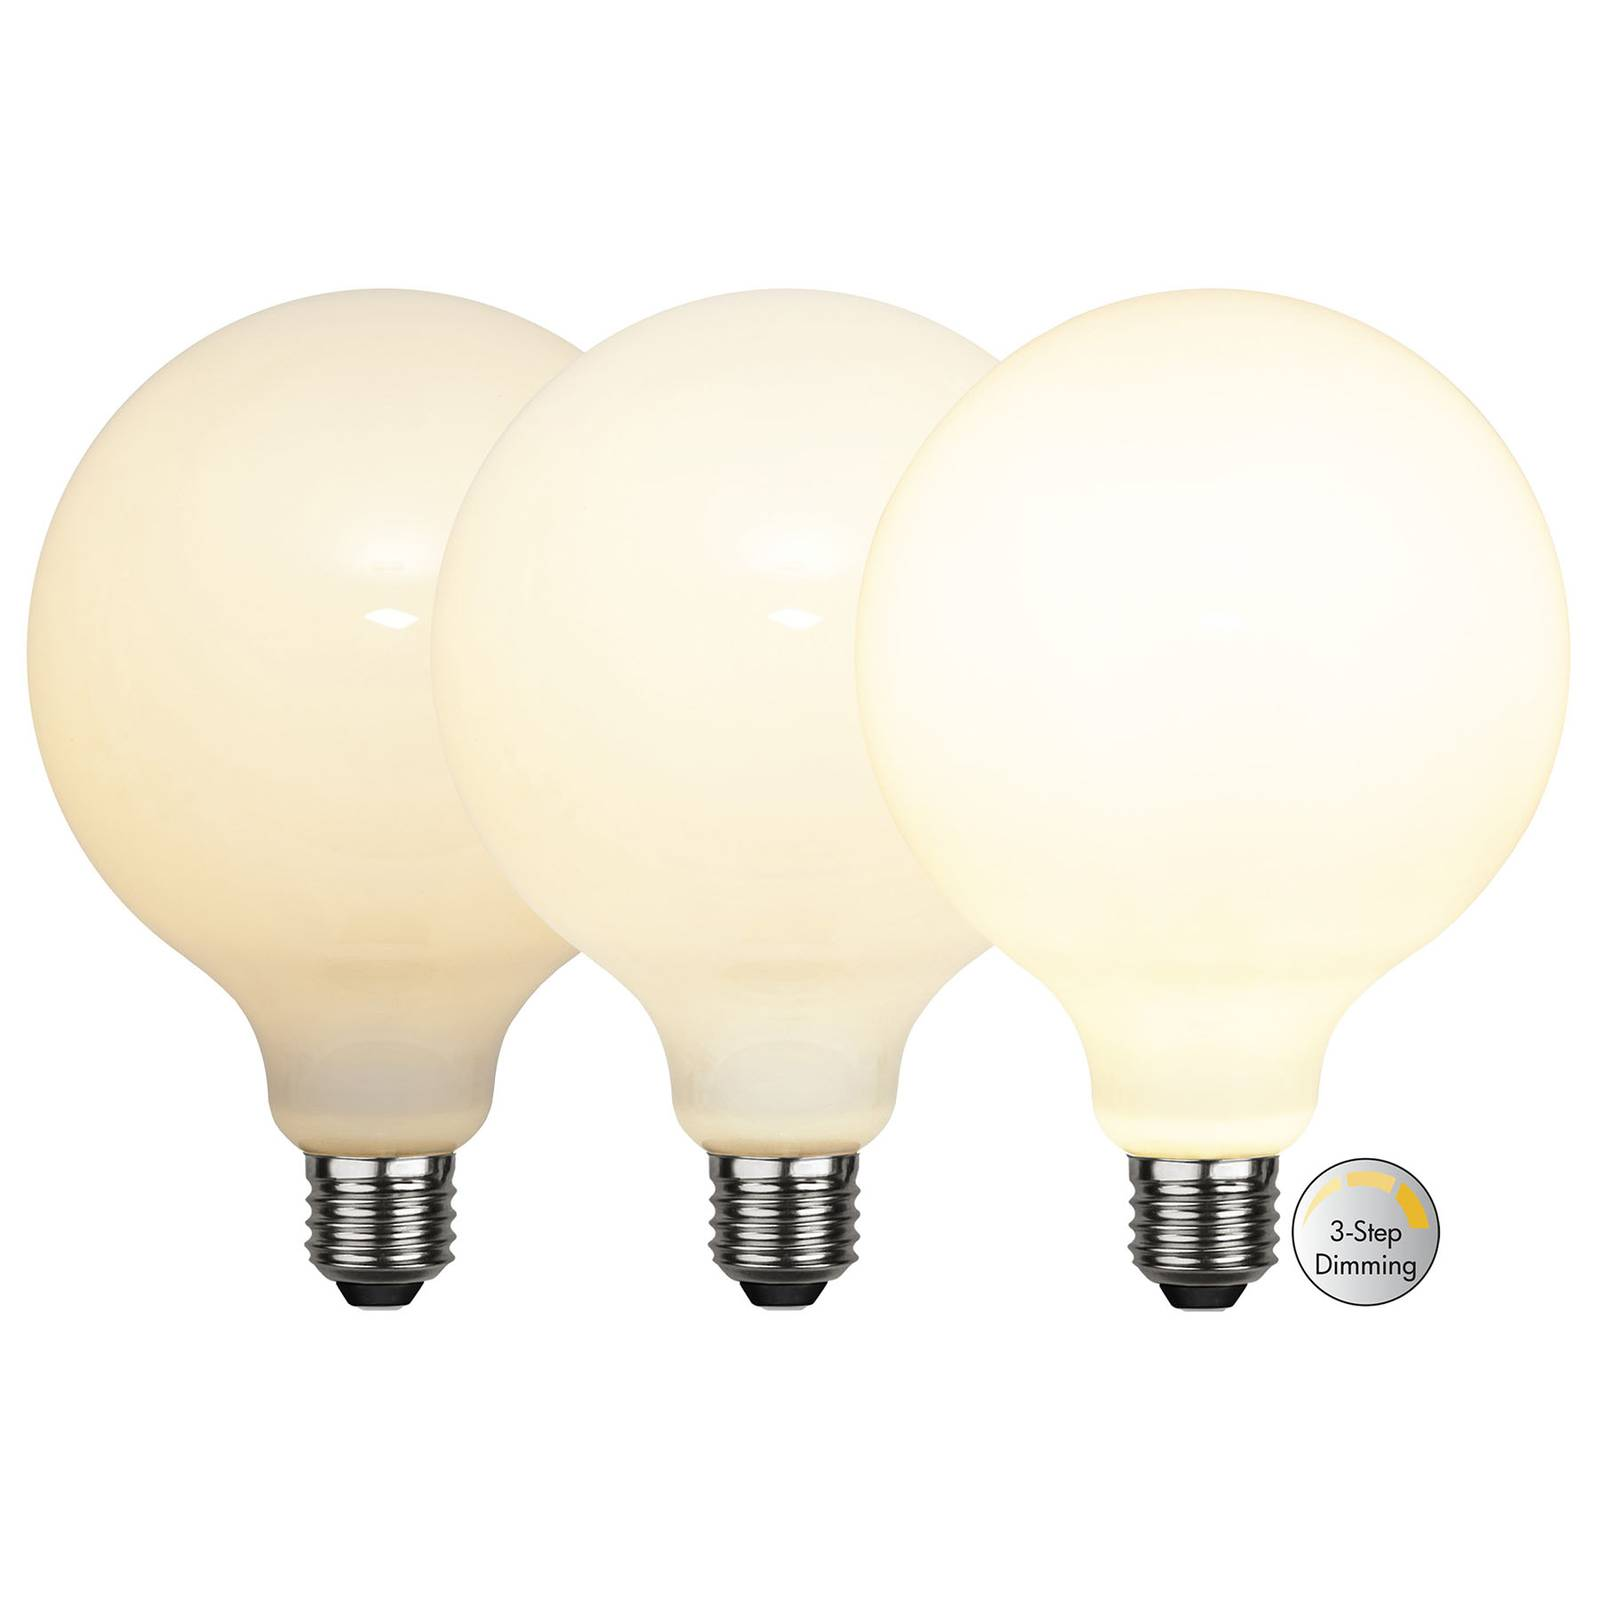 Lampadina LED globe E27 G125 7,5W 3-step-dim opale